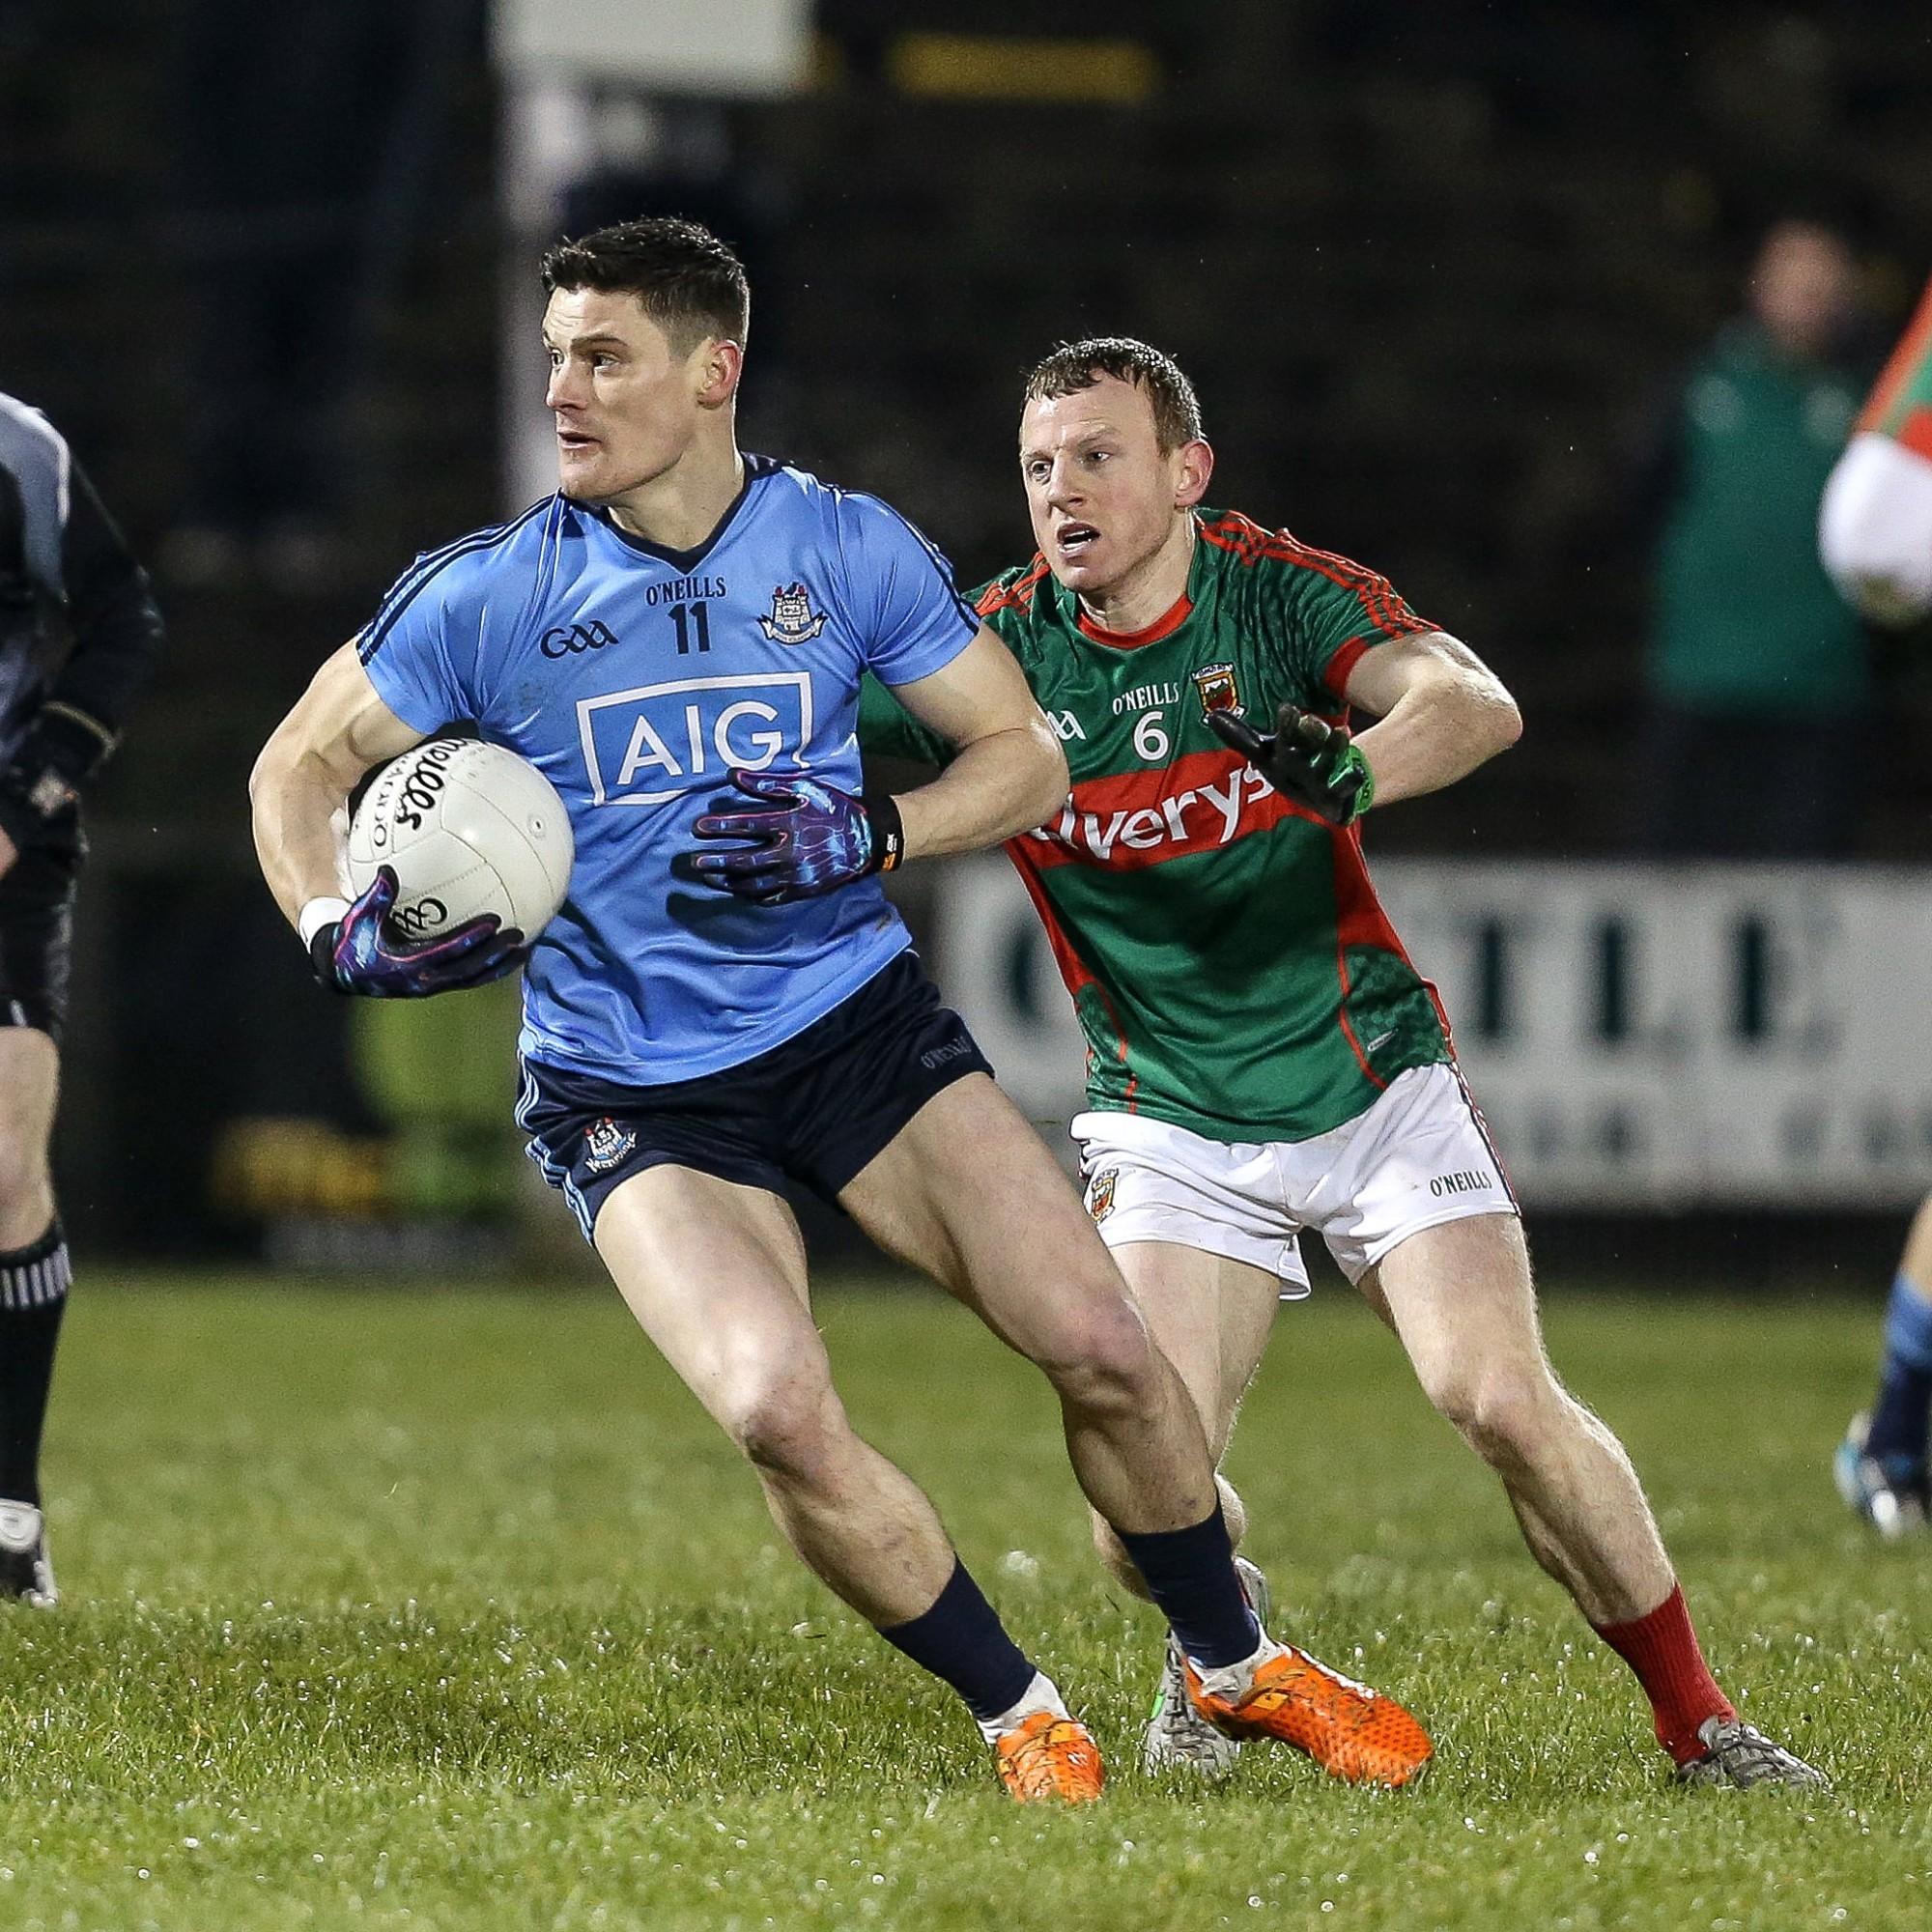 LIVE: Mayo v Dublin, Allianz Division 1 Football League